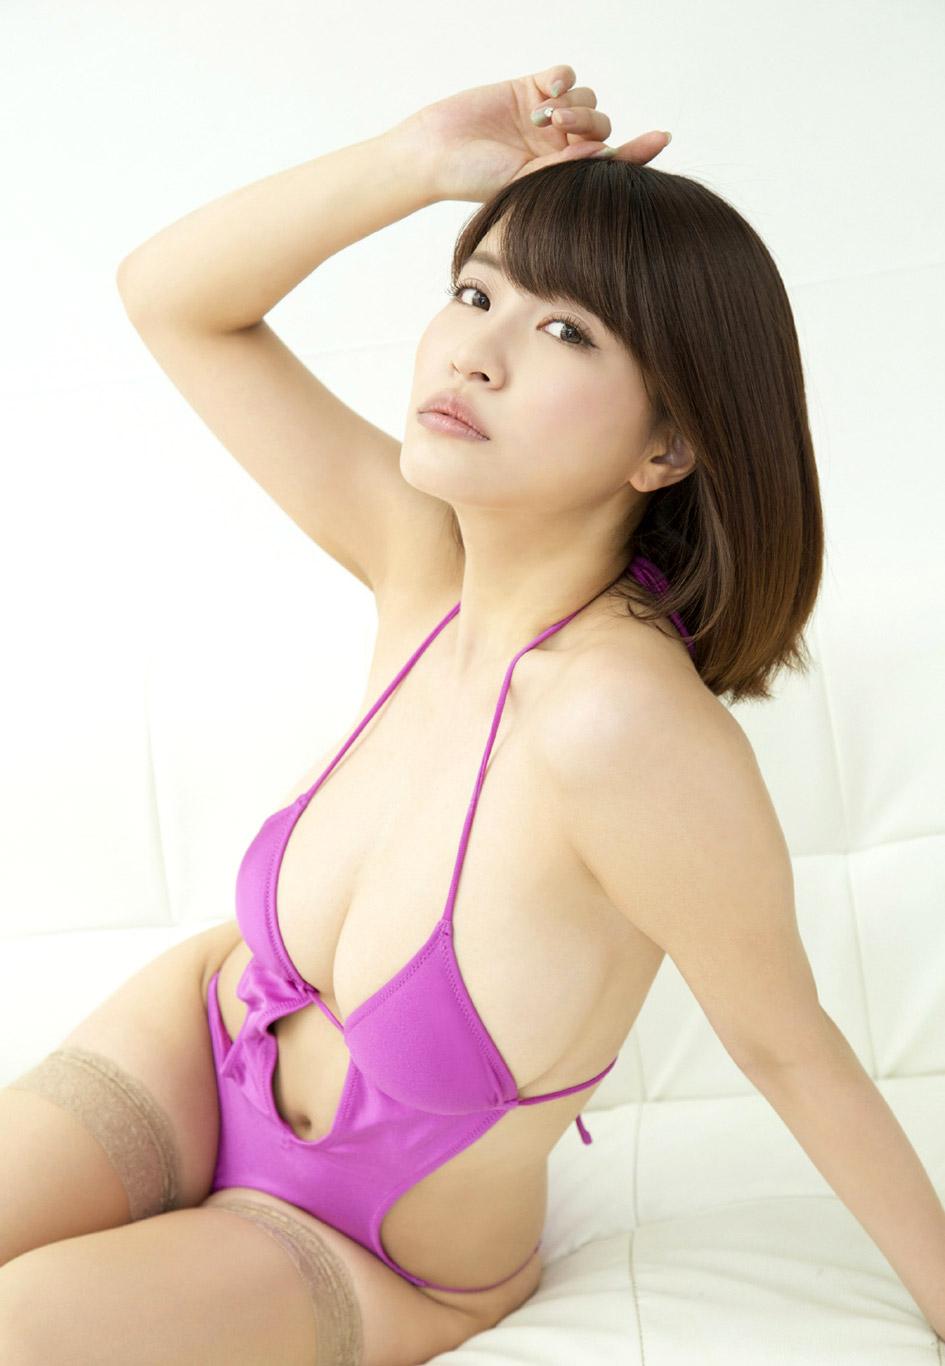 Asuka Kishi Porn asiauncensored japan sex asuka kishi 岸明日香 pics 114!